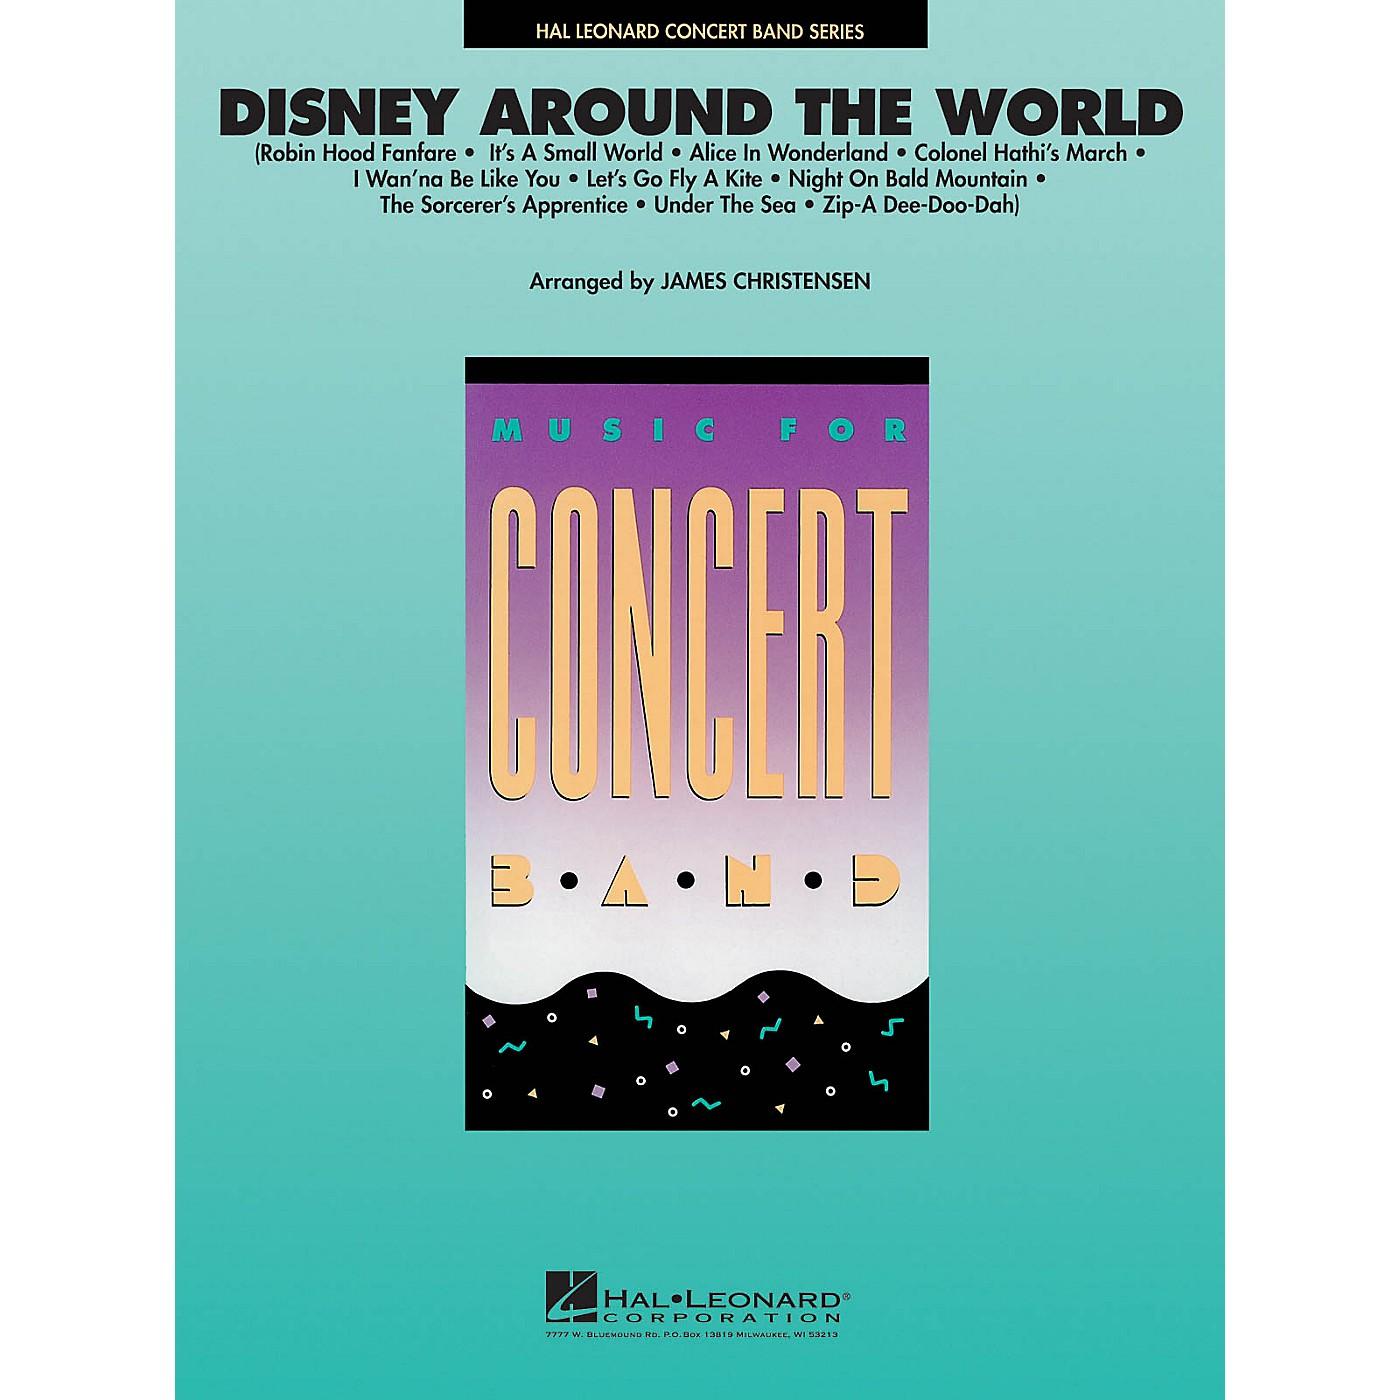 Hal Leonard Disney Around the World Concert Band Level 4 Arranged by James Christensen thumbnail